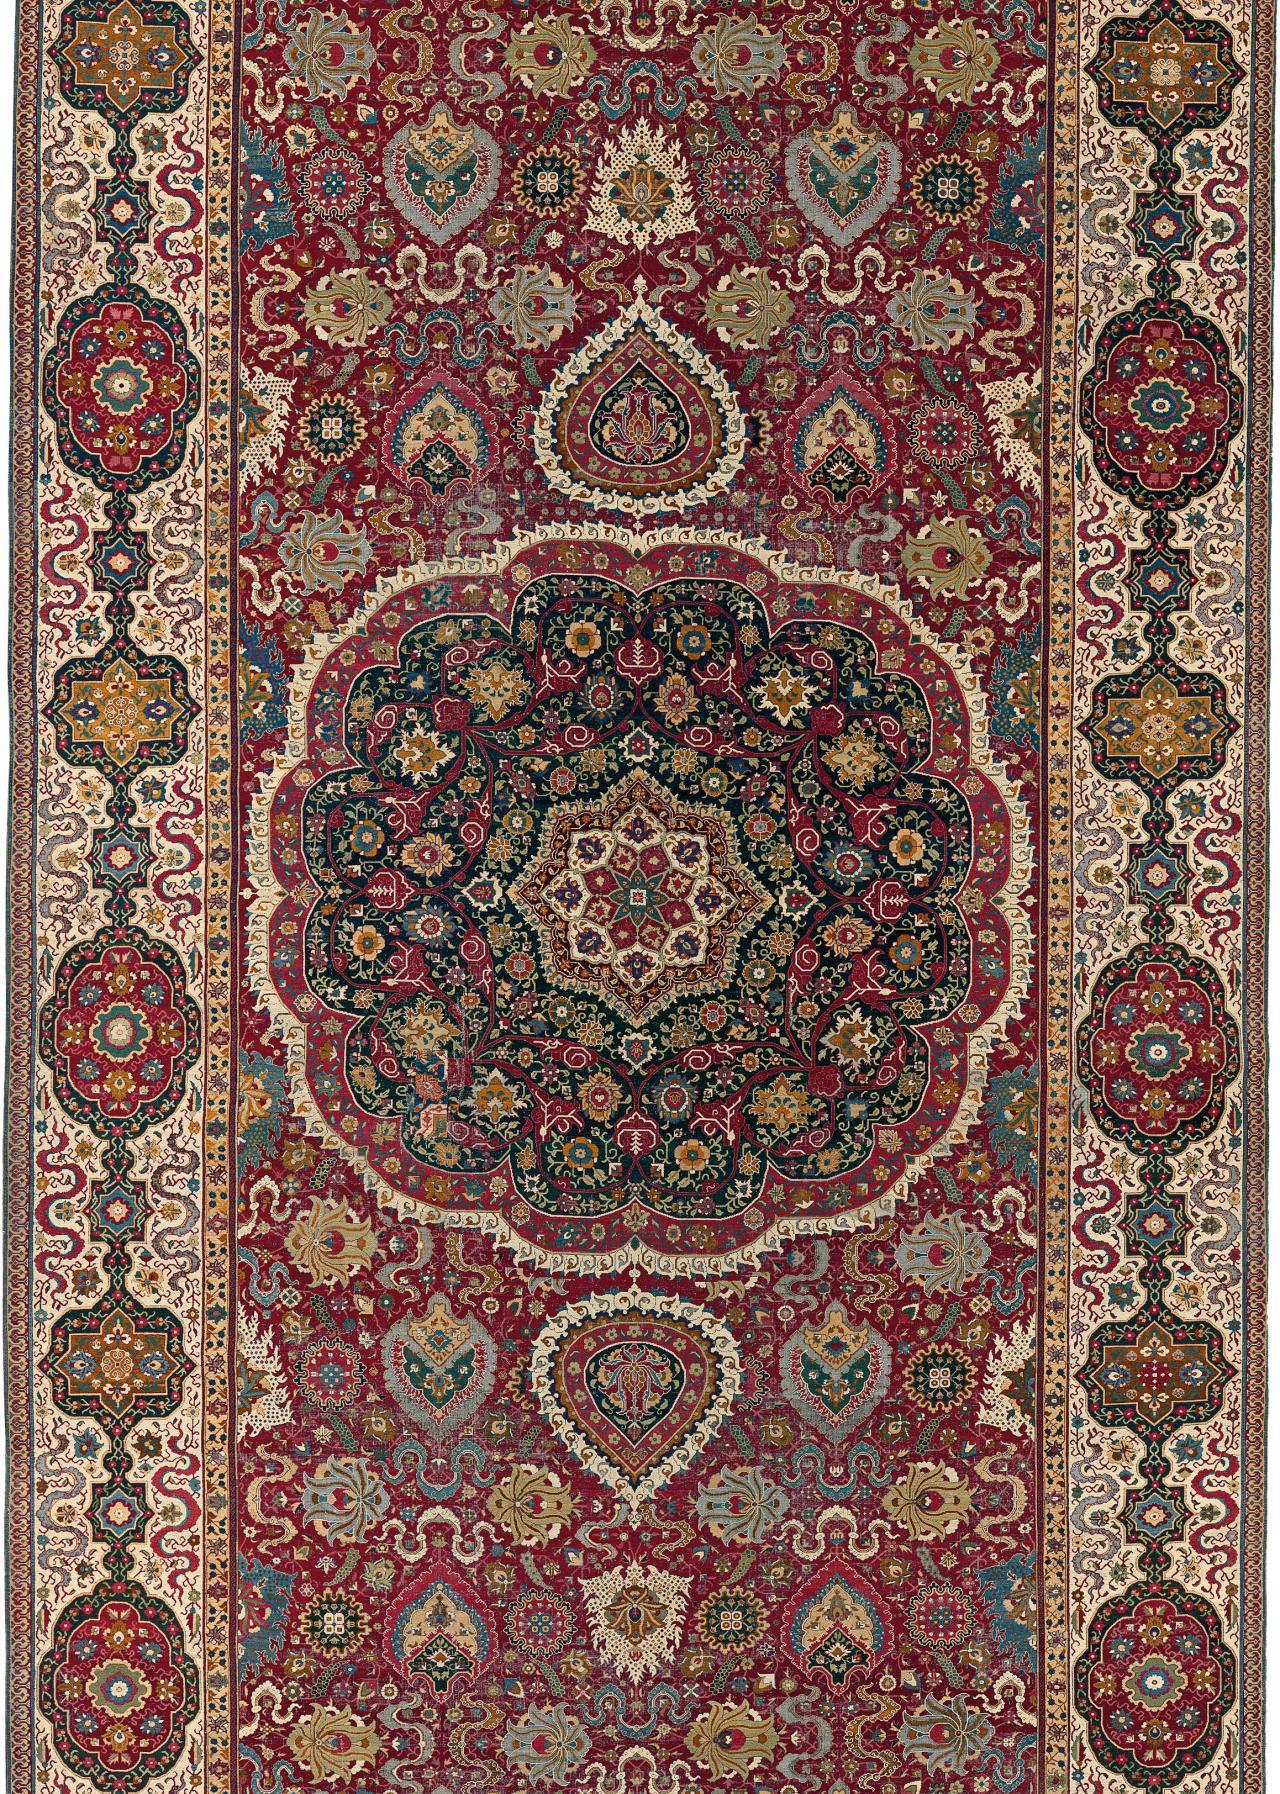 The Trinitarias Carpet Early Masterpiece Or Modern